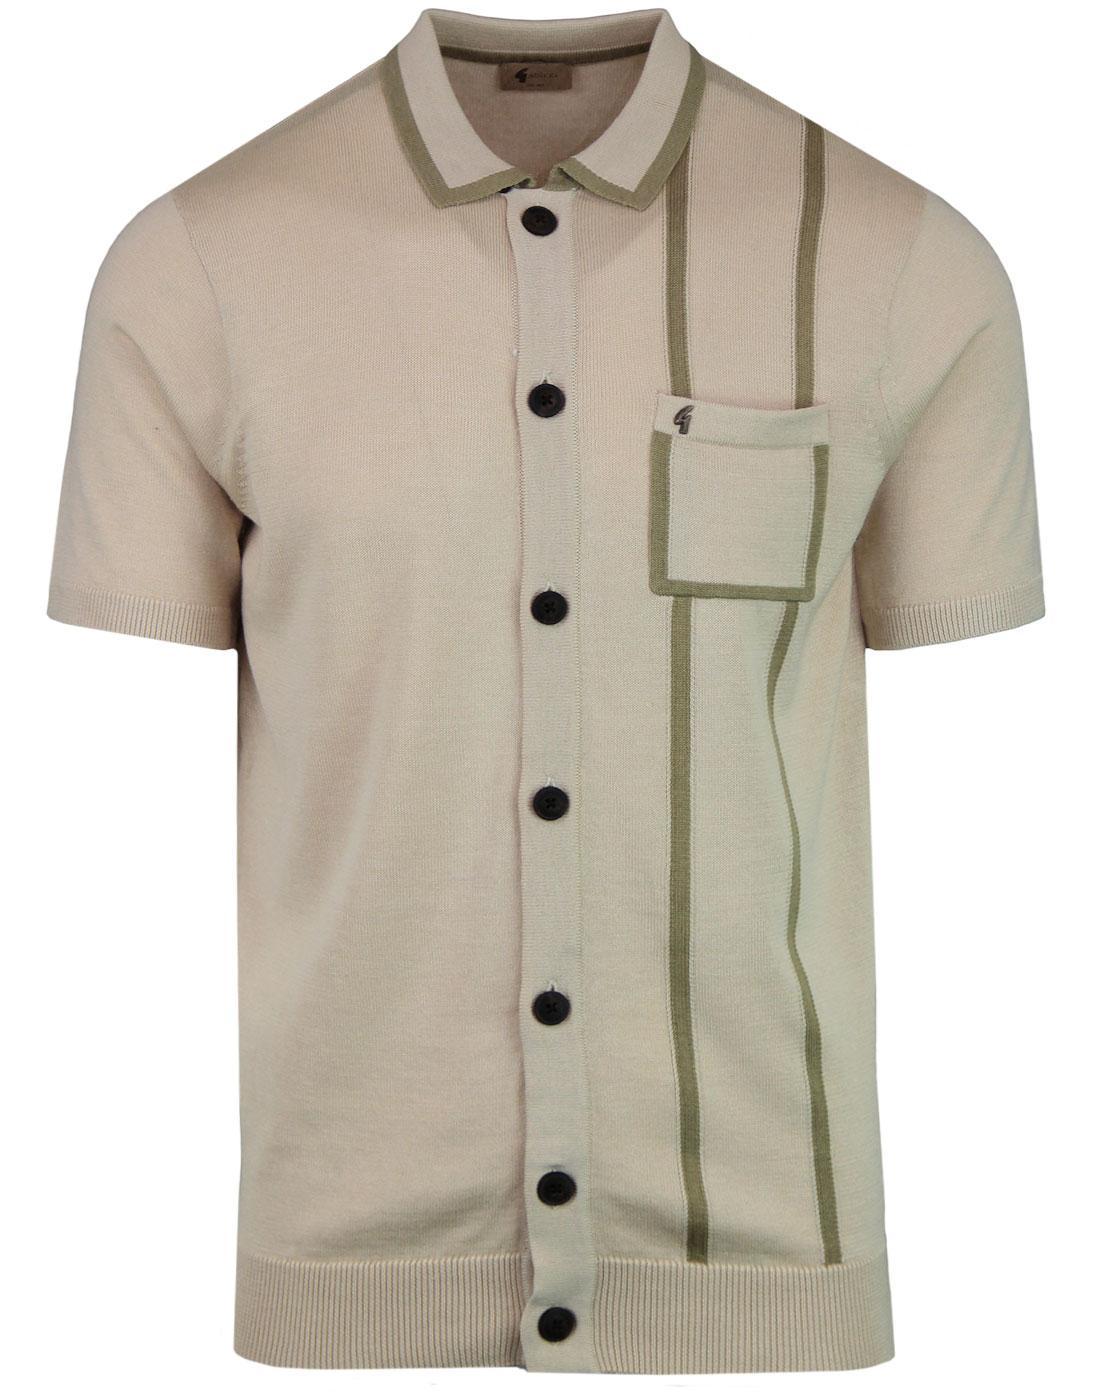 Enquirer GABICCI VINTAGE 60s Knit Polo Cardigan O